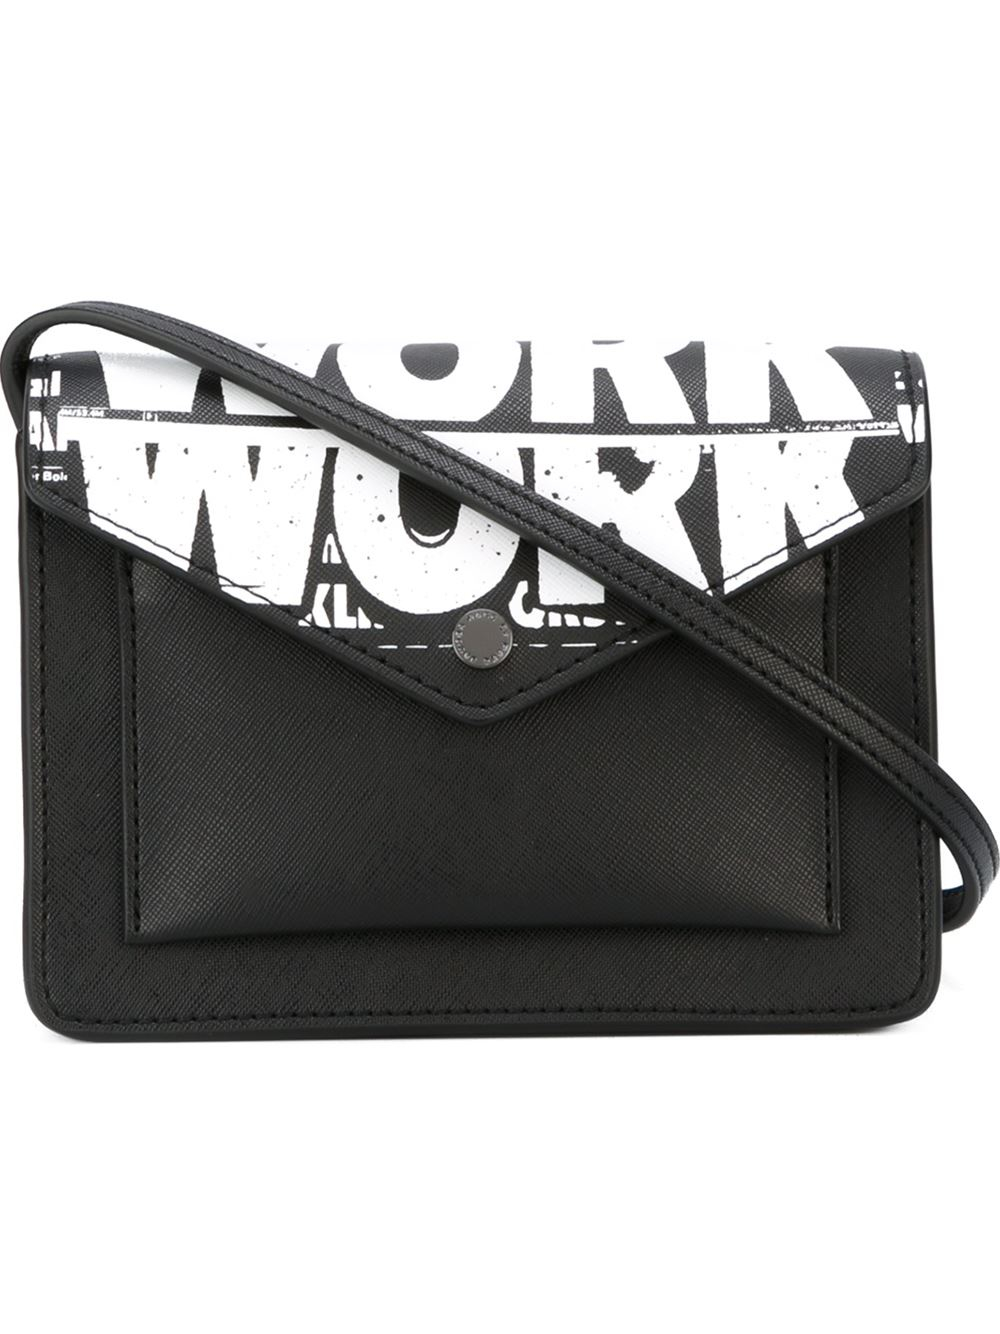 1a4b021cb94a Lyst - Marc By Marc Jacobs Work Print Crossbody Bag in Black